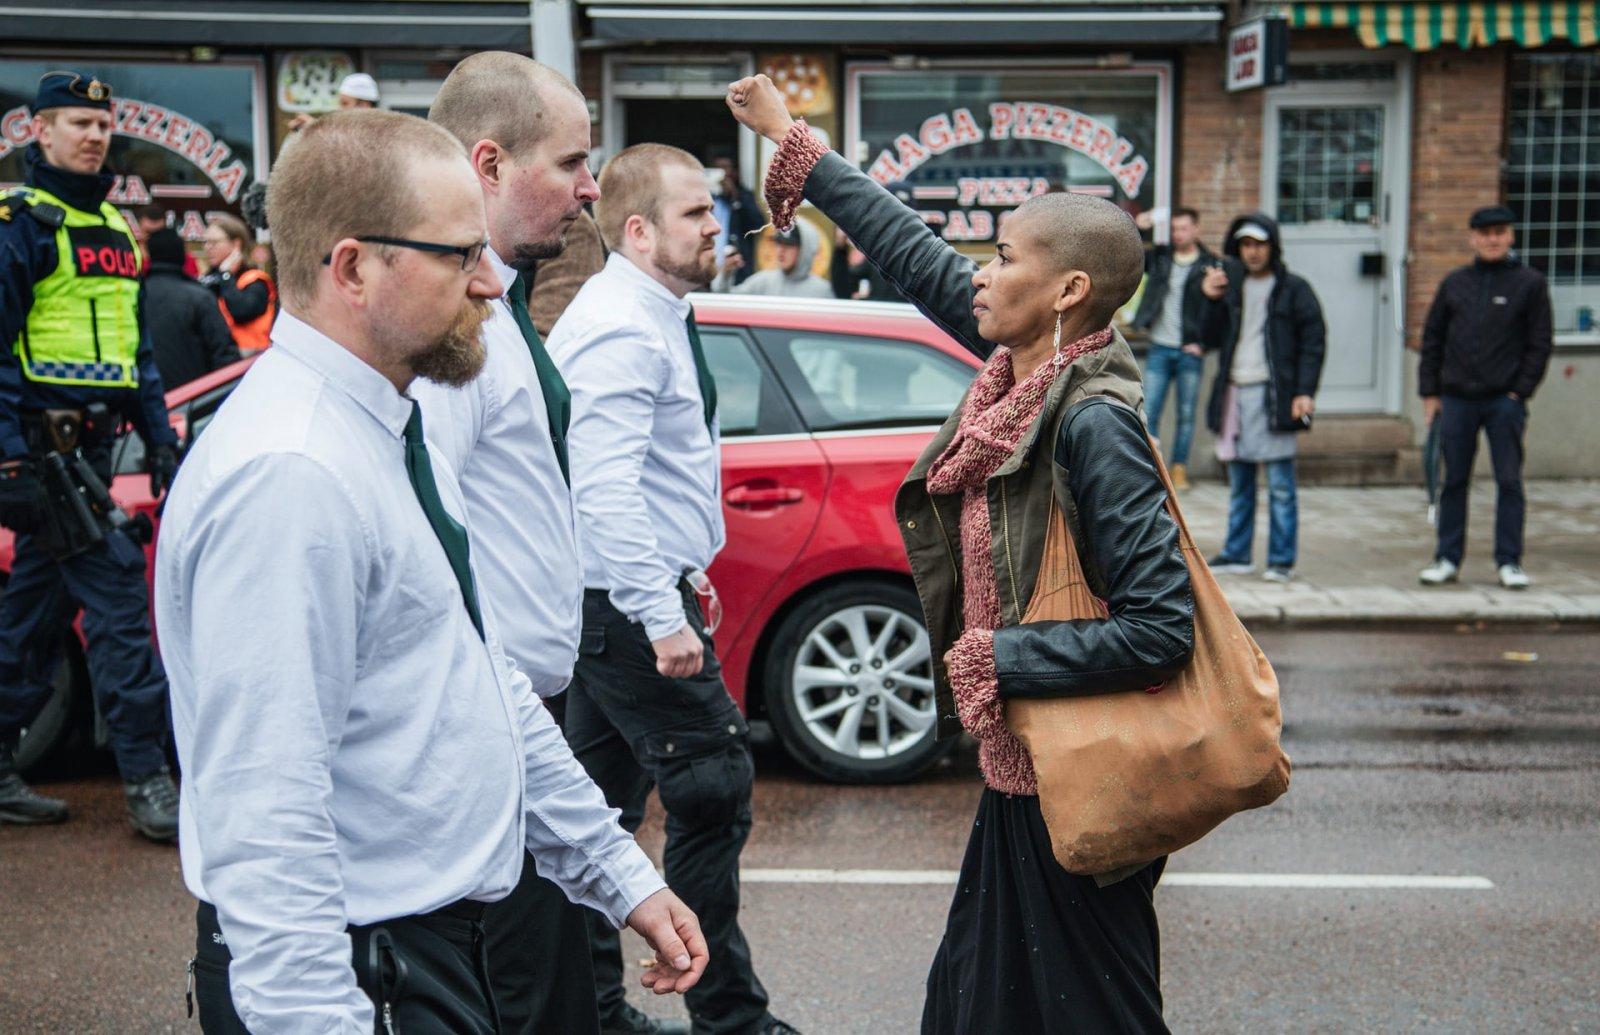 Tess Asplund enfrentándose a manifestantes neonazis, dejando una imagen icónica.